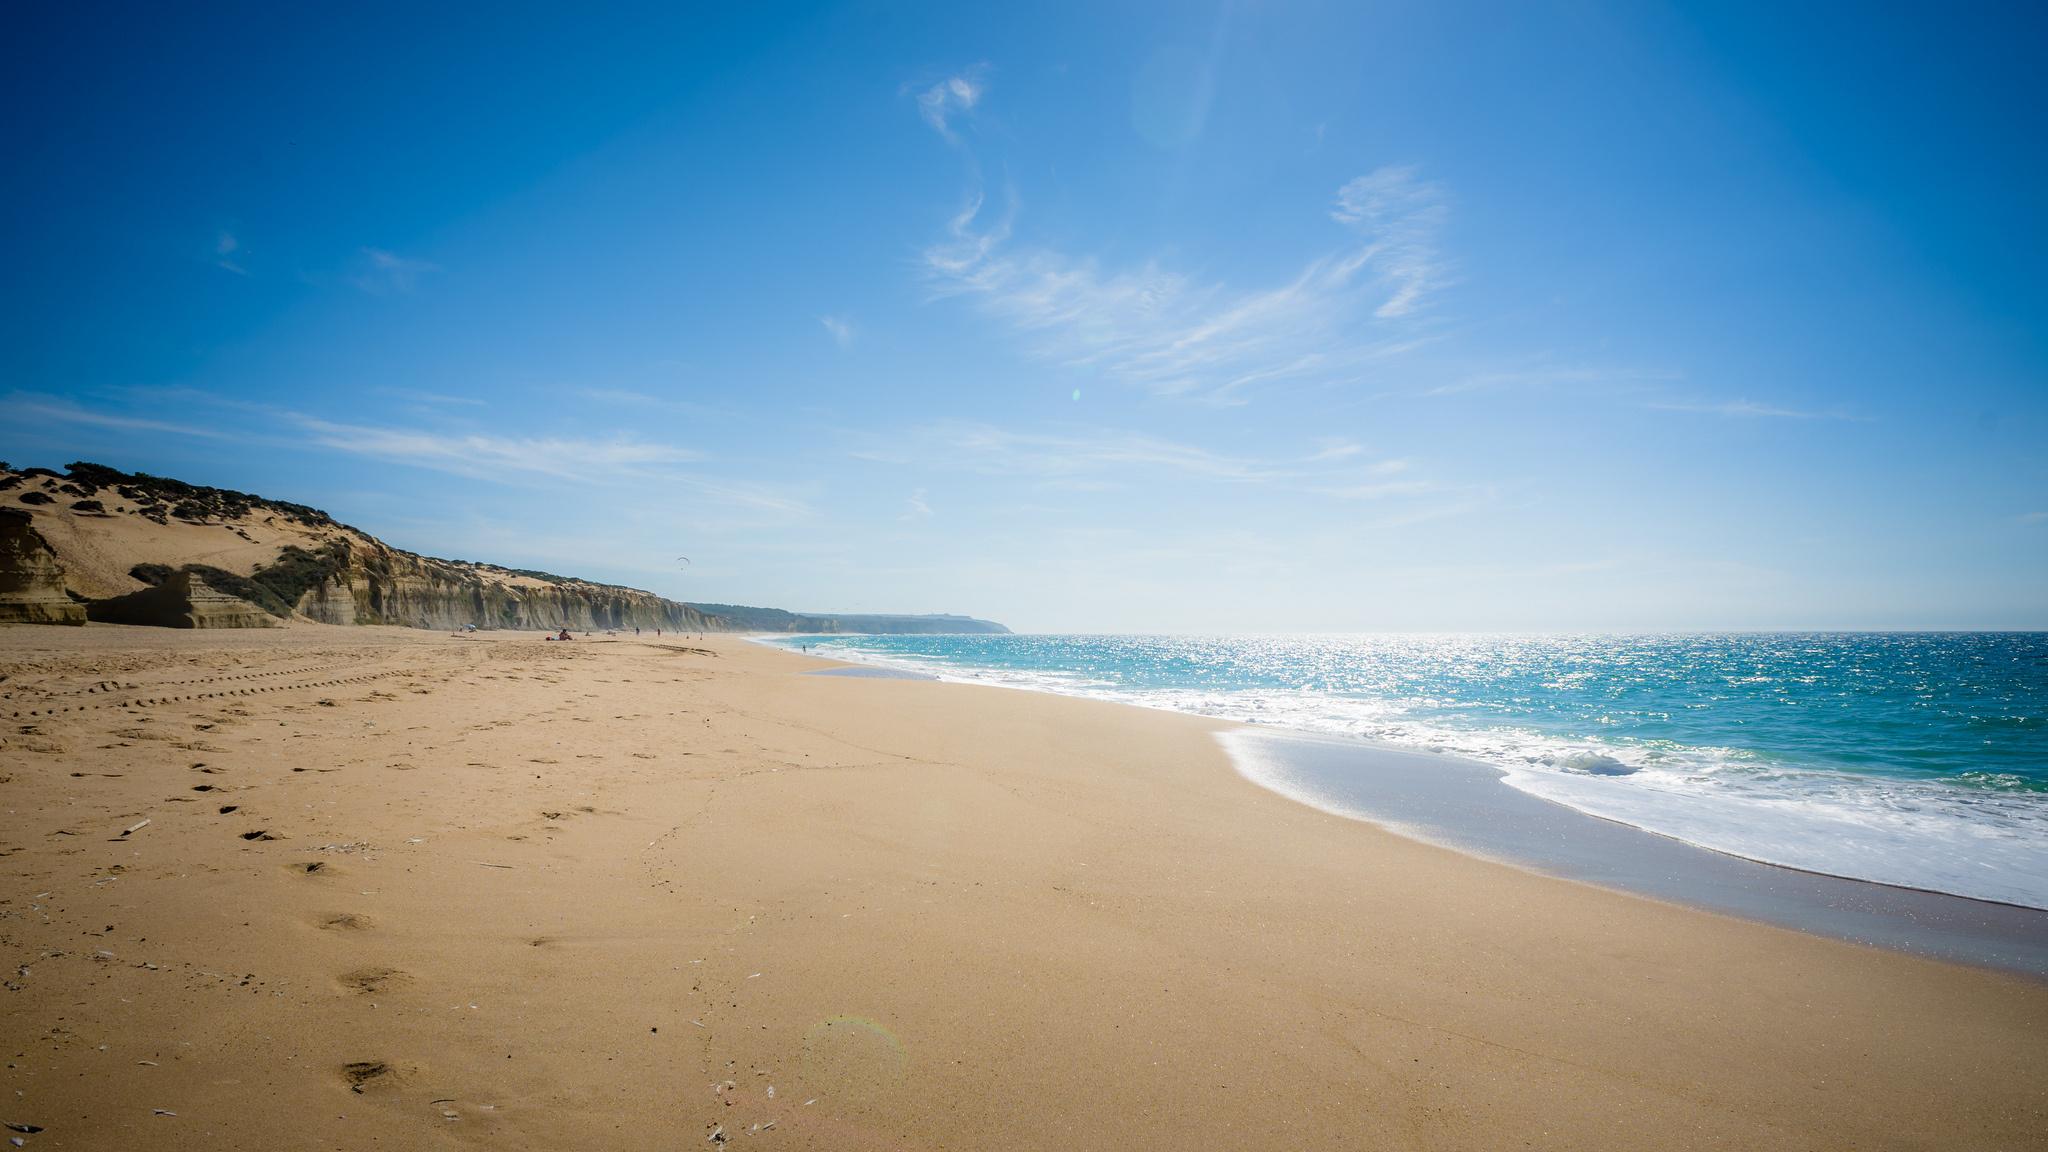 Beach landscape signs nature sand wallpaper | 2048x1152 ...